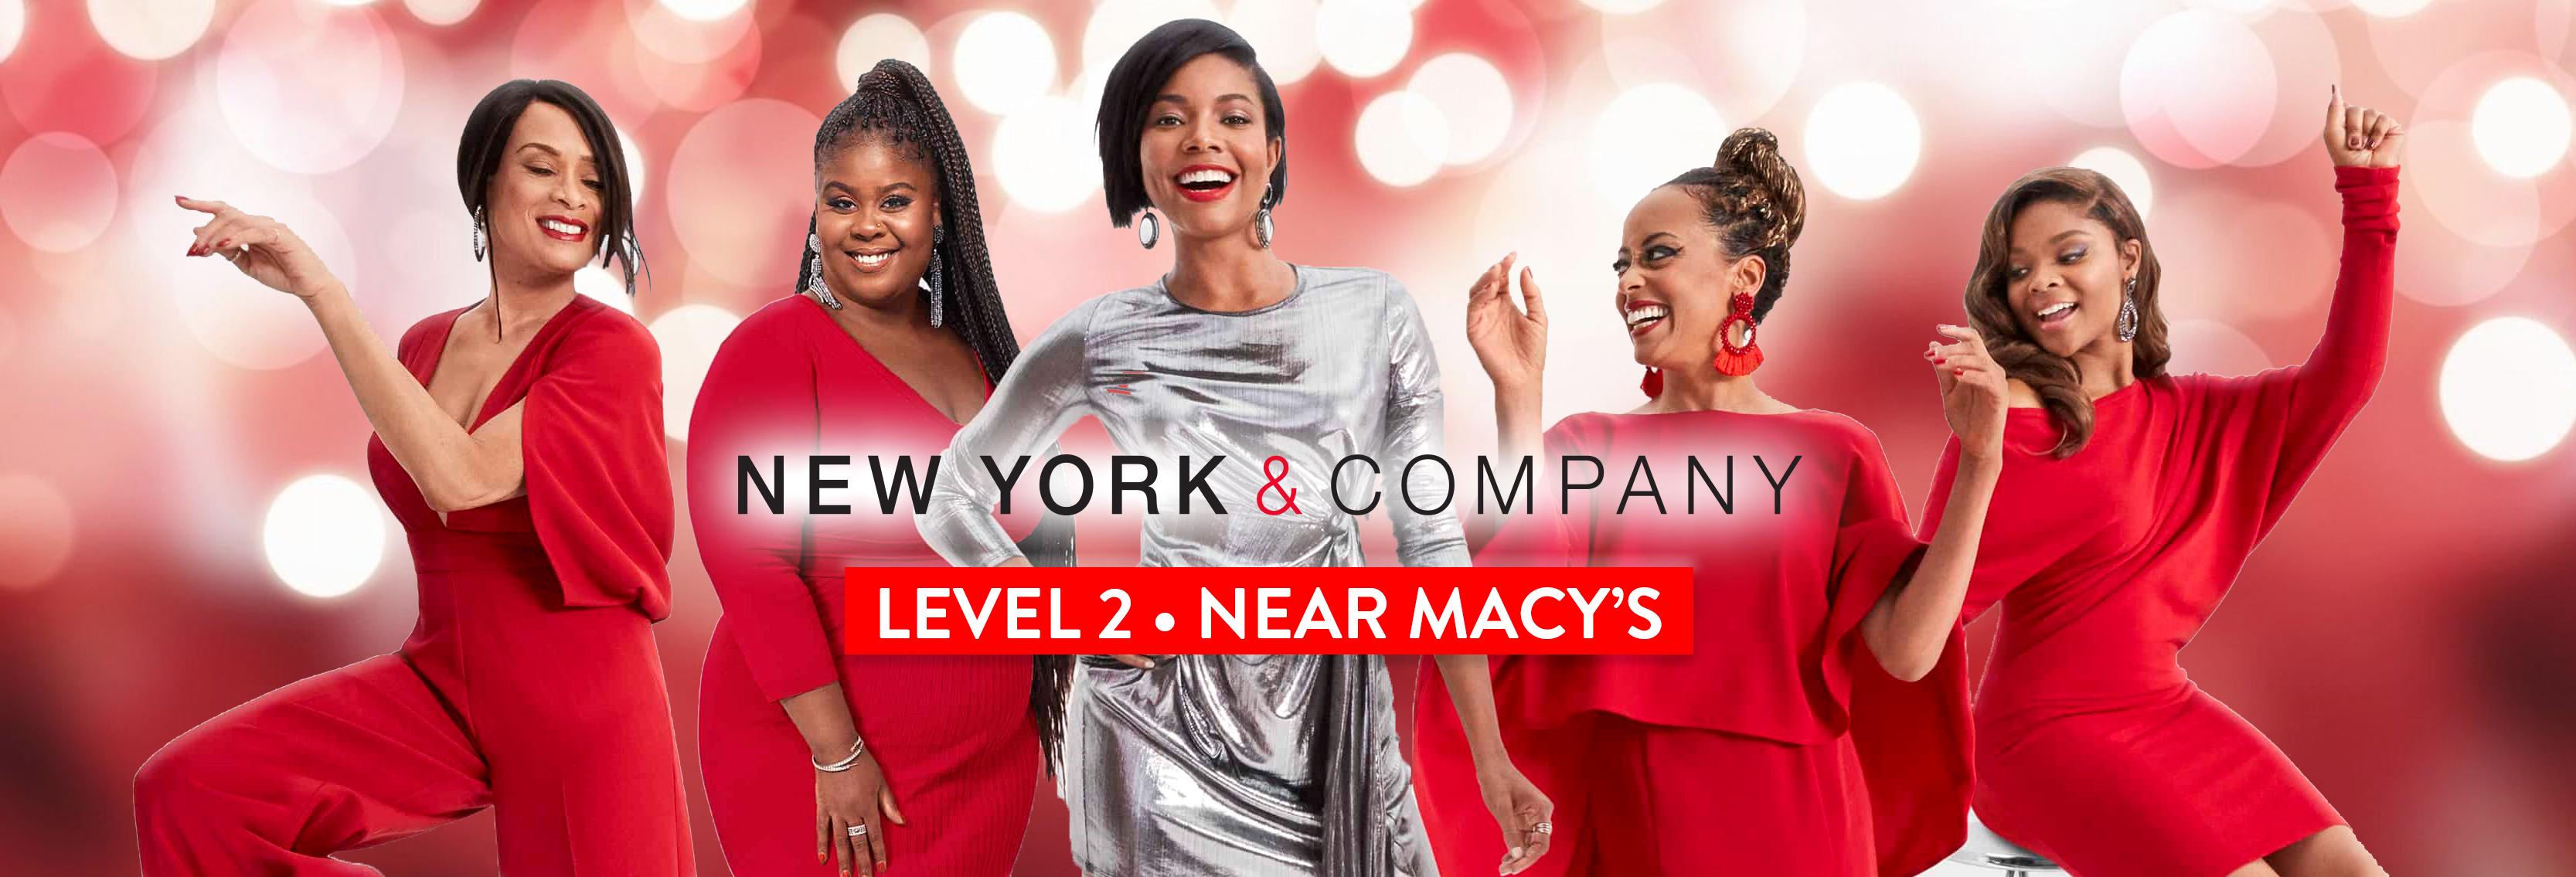 11 27 Palisades NYC website